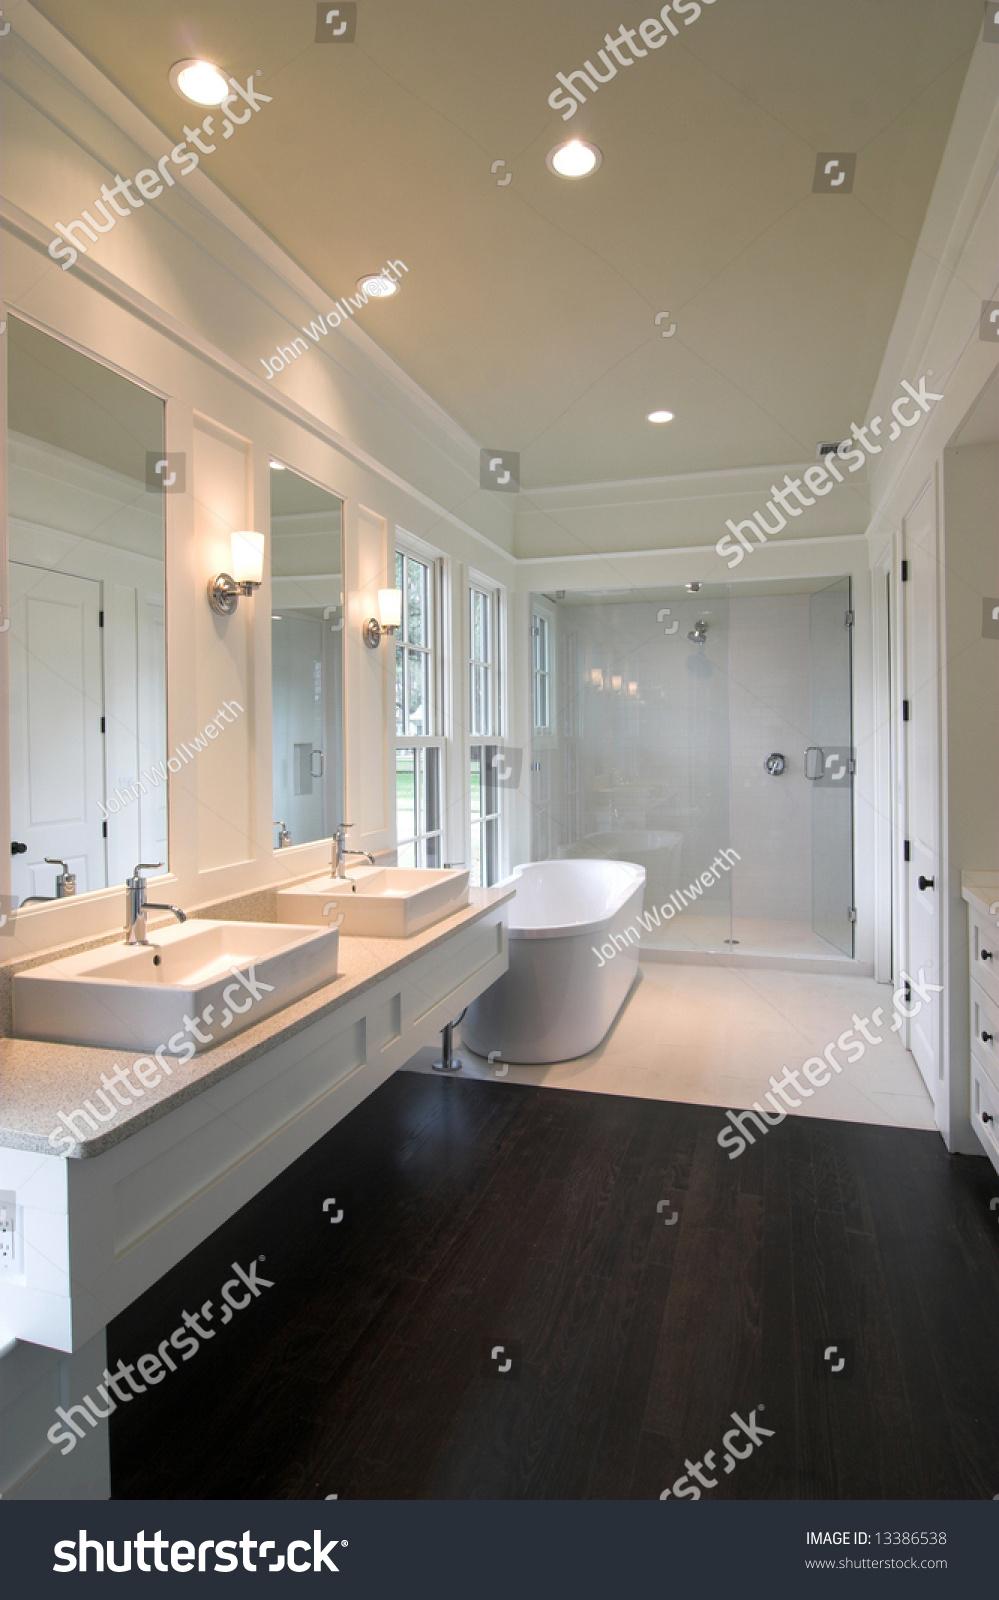 Dark wood floor bathroom - Dark Wood Floor Bathroom Bathroom With Dark Wood Floors Download